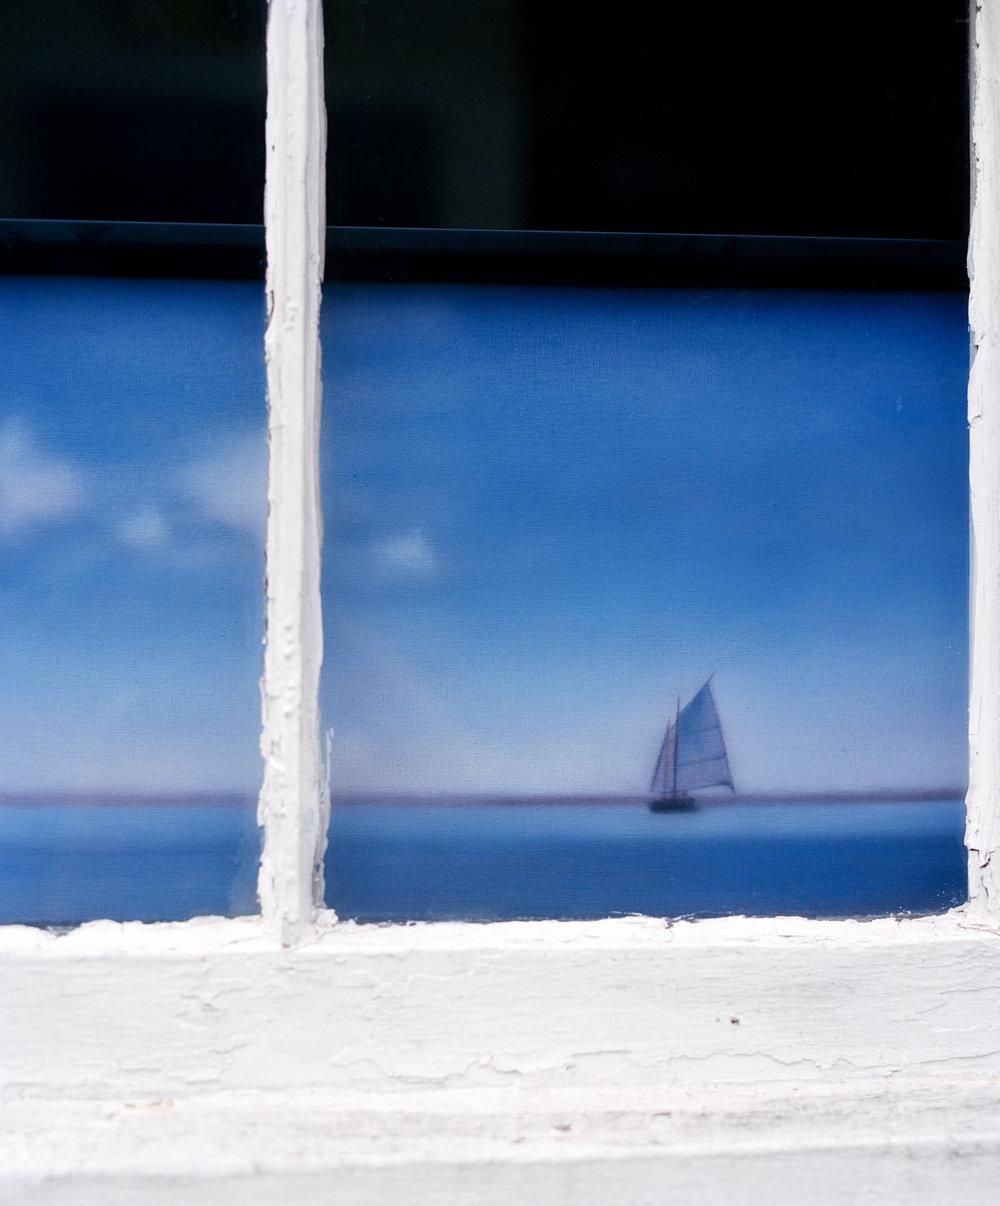 smallship.jpg